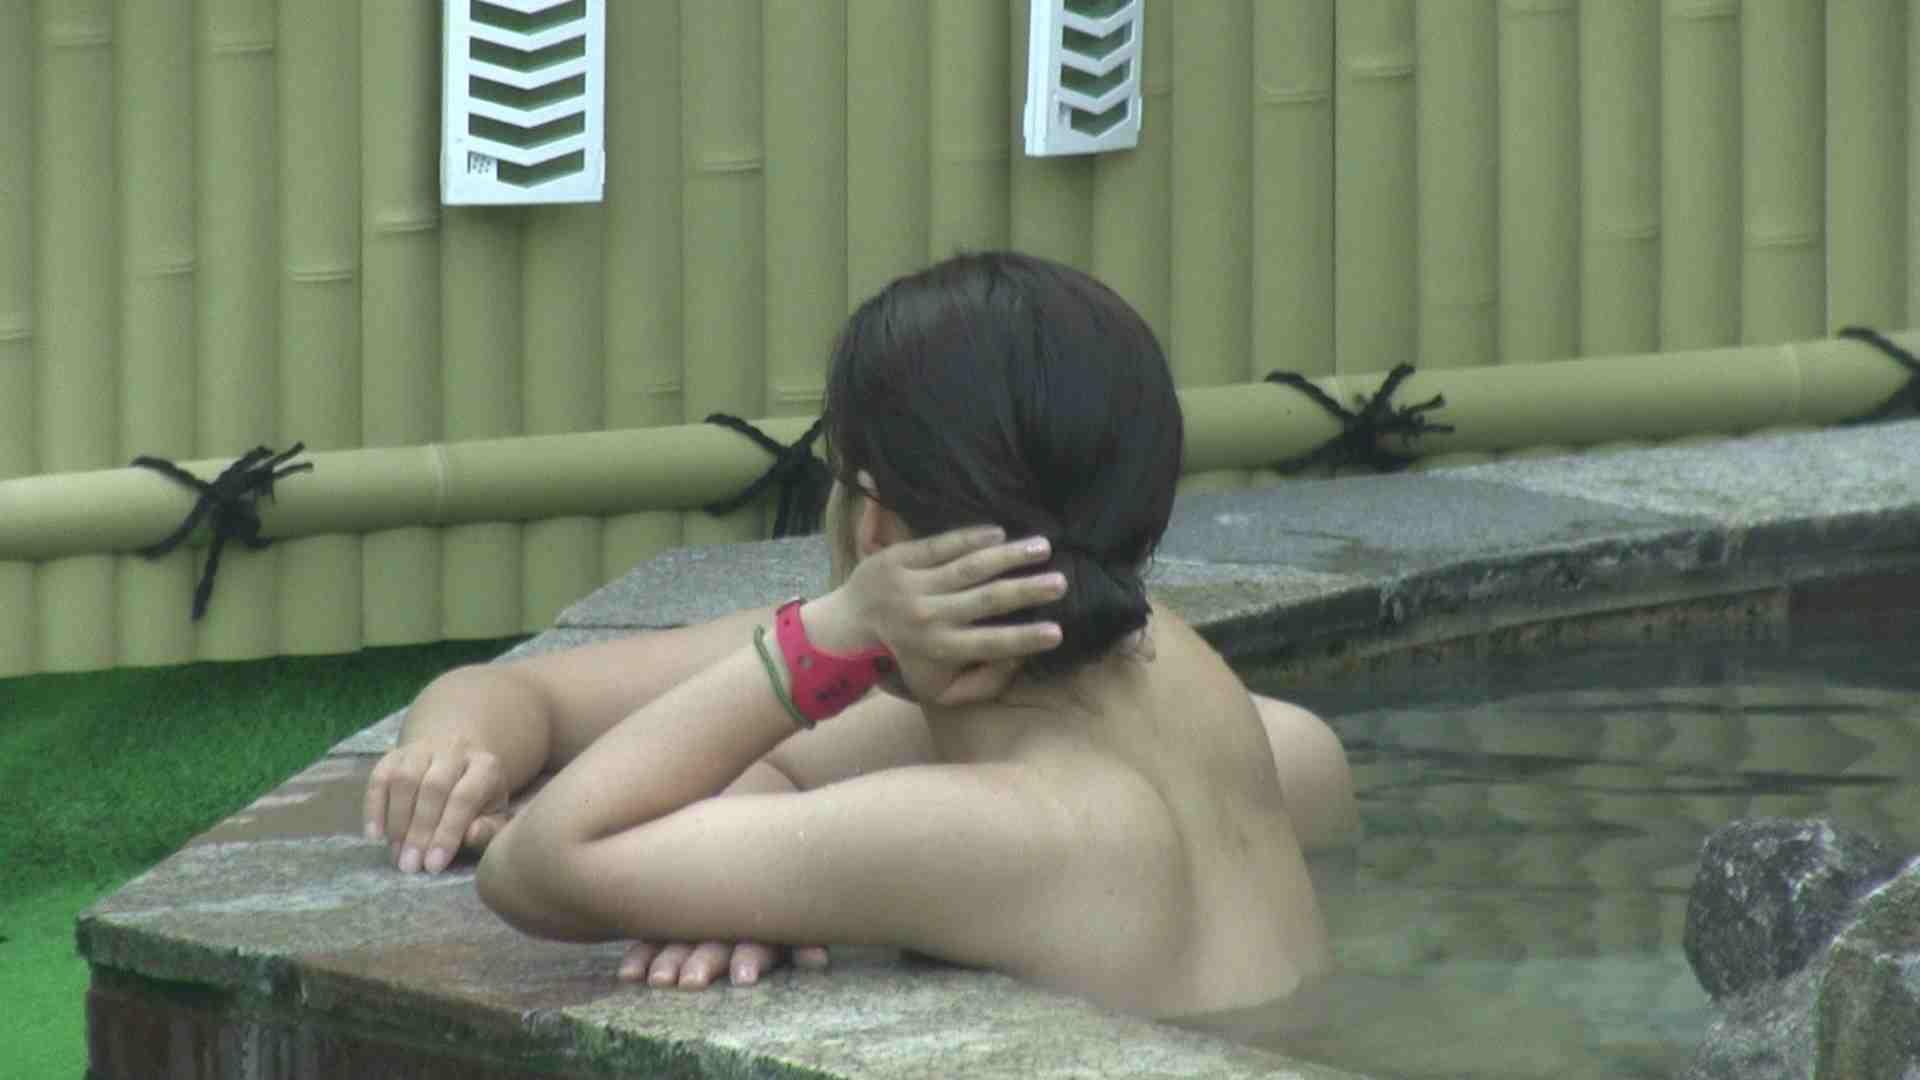 Aquaな露天風呂Vol.182 露天 | OLセックス  80画像 52